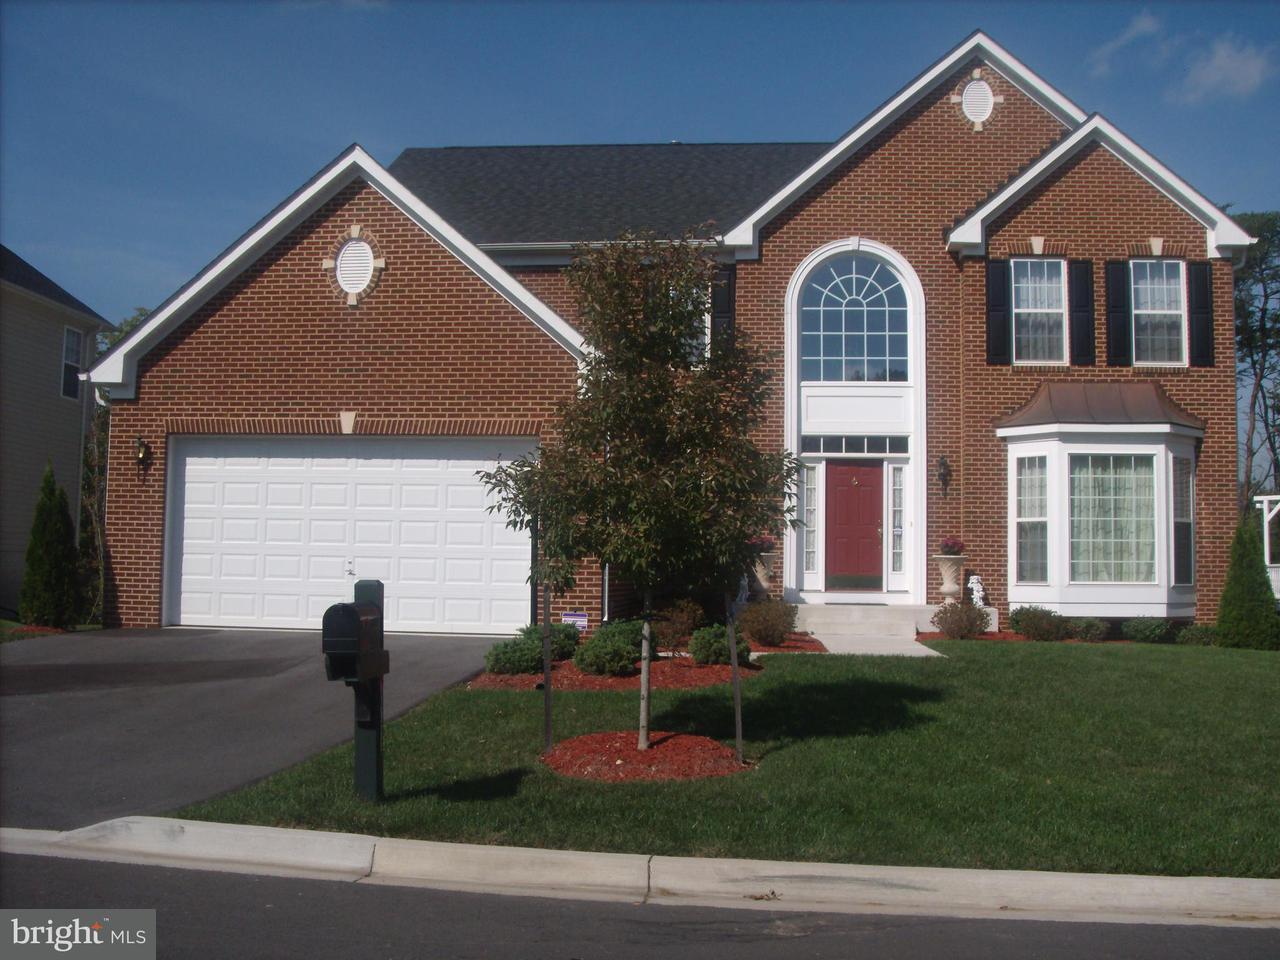 Single Family Home for Sale at 12906 LEDO CREEK TER 12906 LEDO CREEK TER Beltsville, Maryland 20705 United States